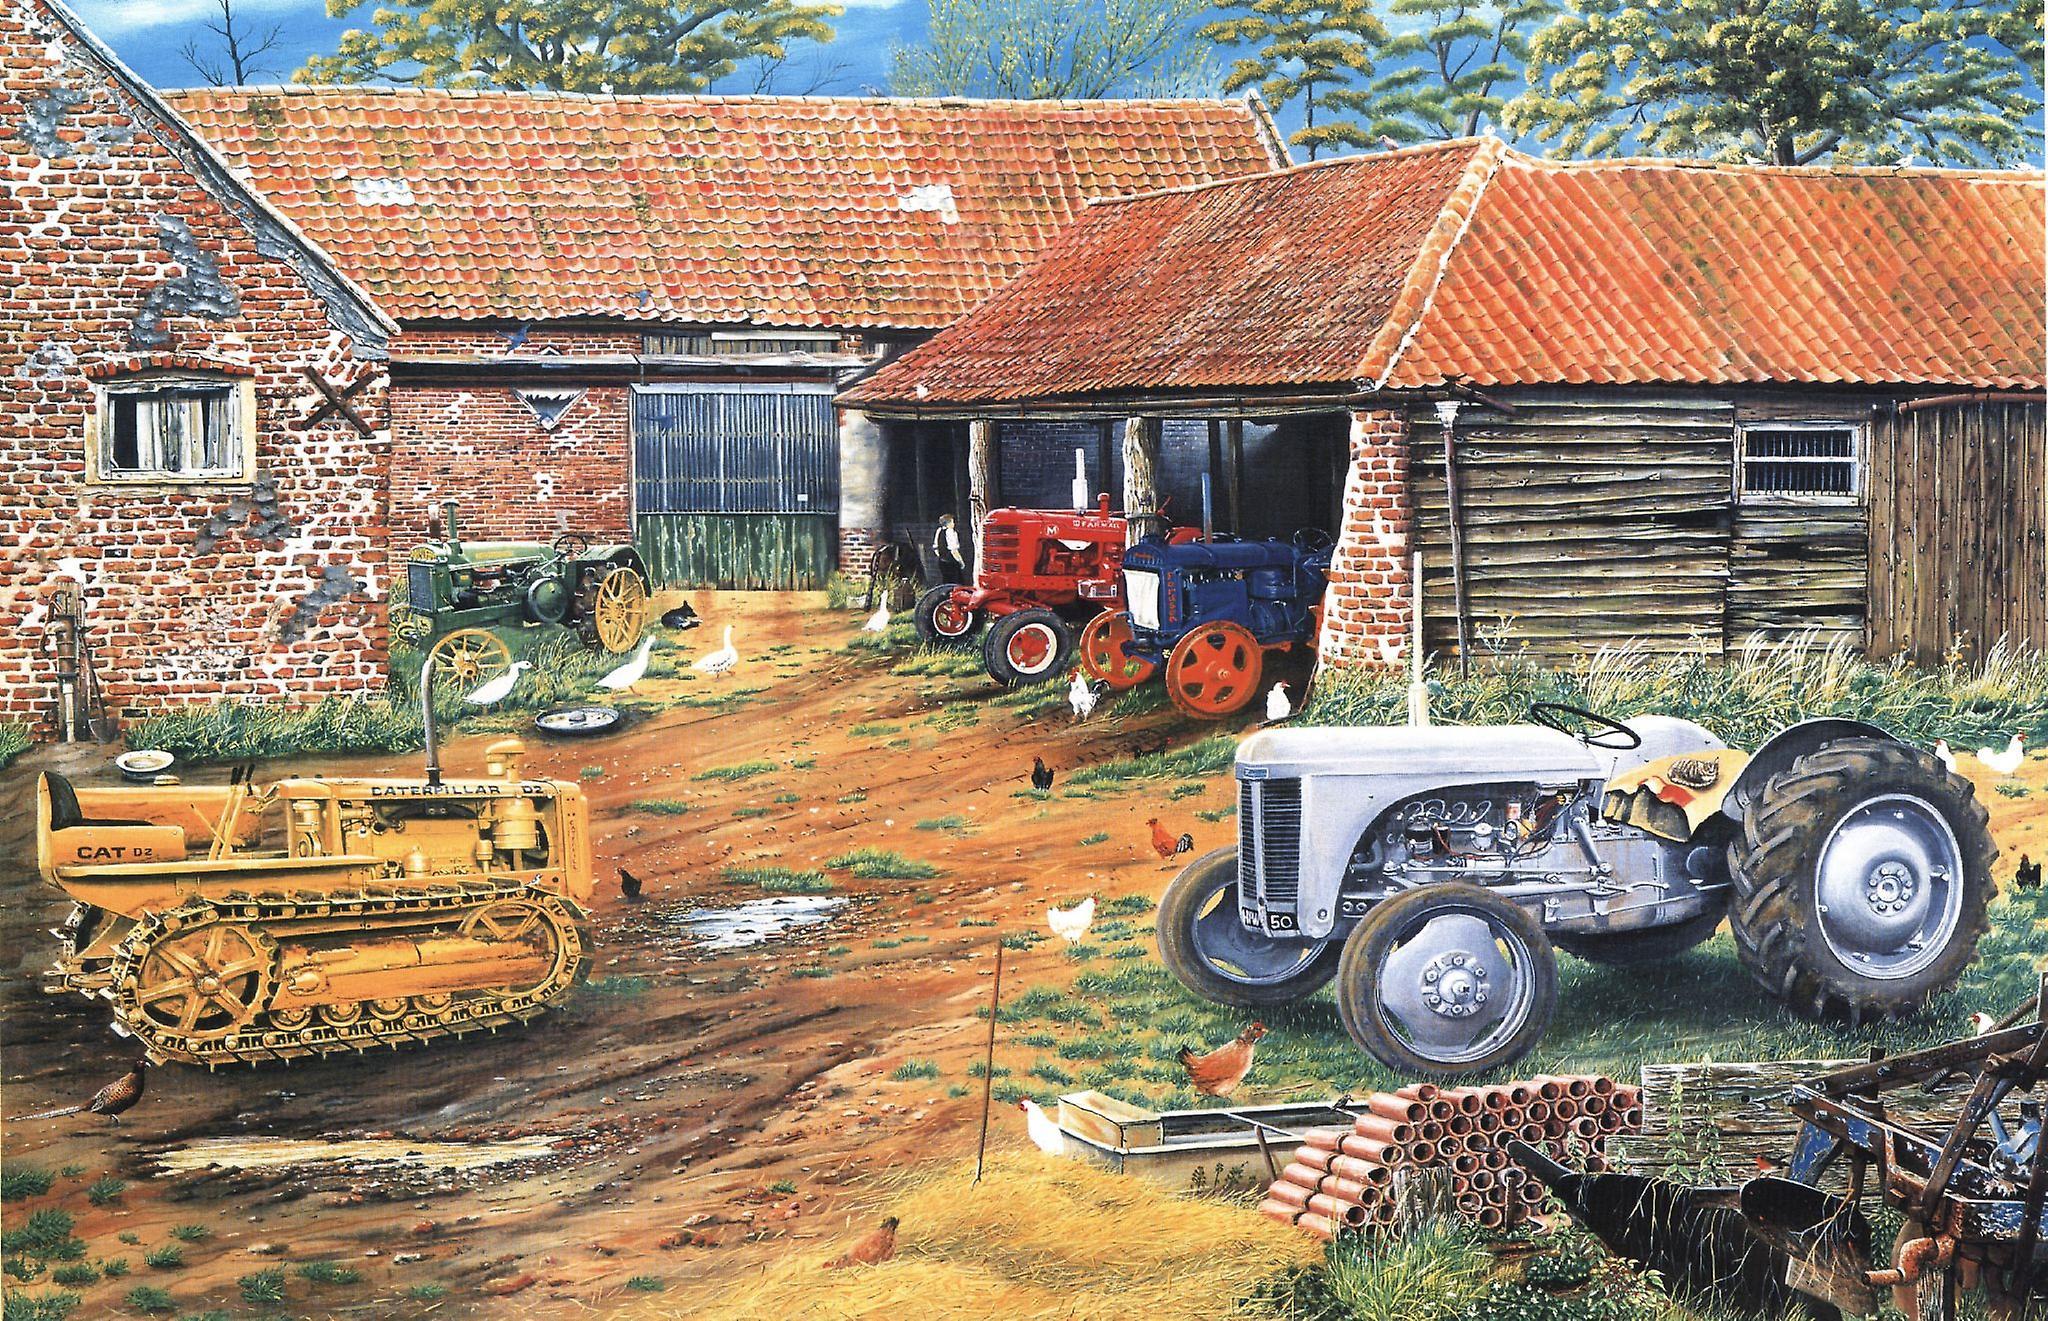 Jordbrukare Classic Collection av Roy Didwell 1000 bit pussel 690 x 480 mm (jg)